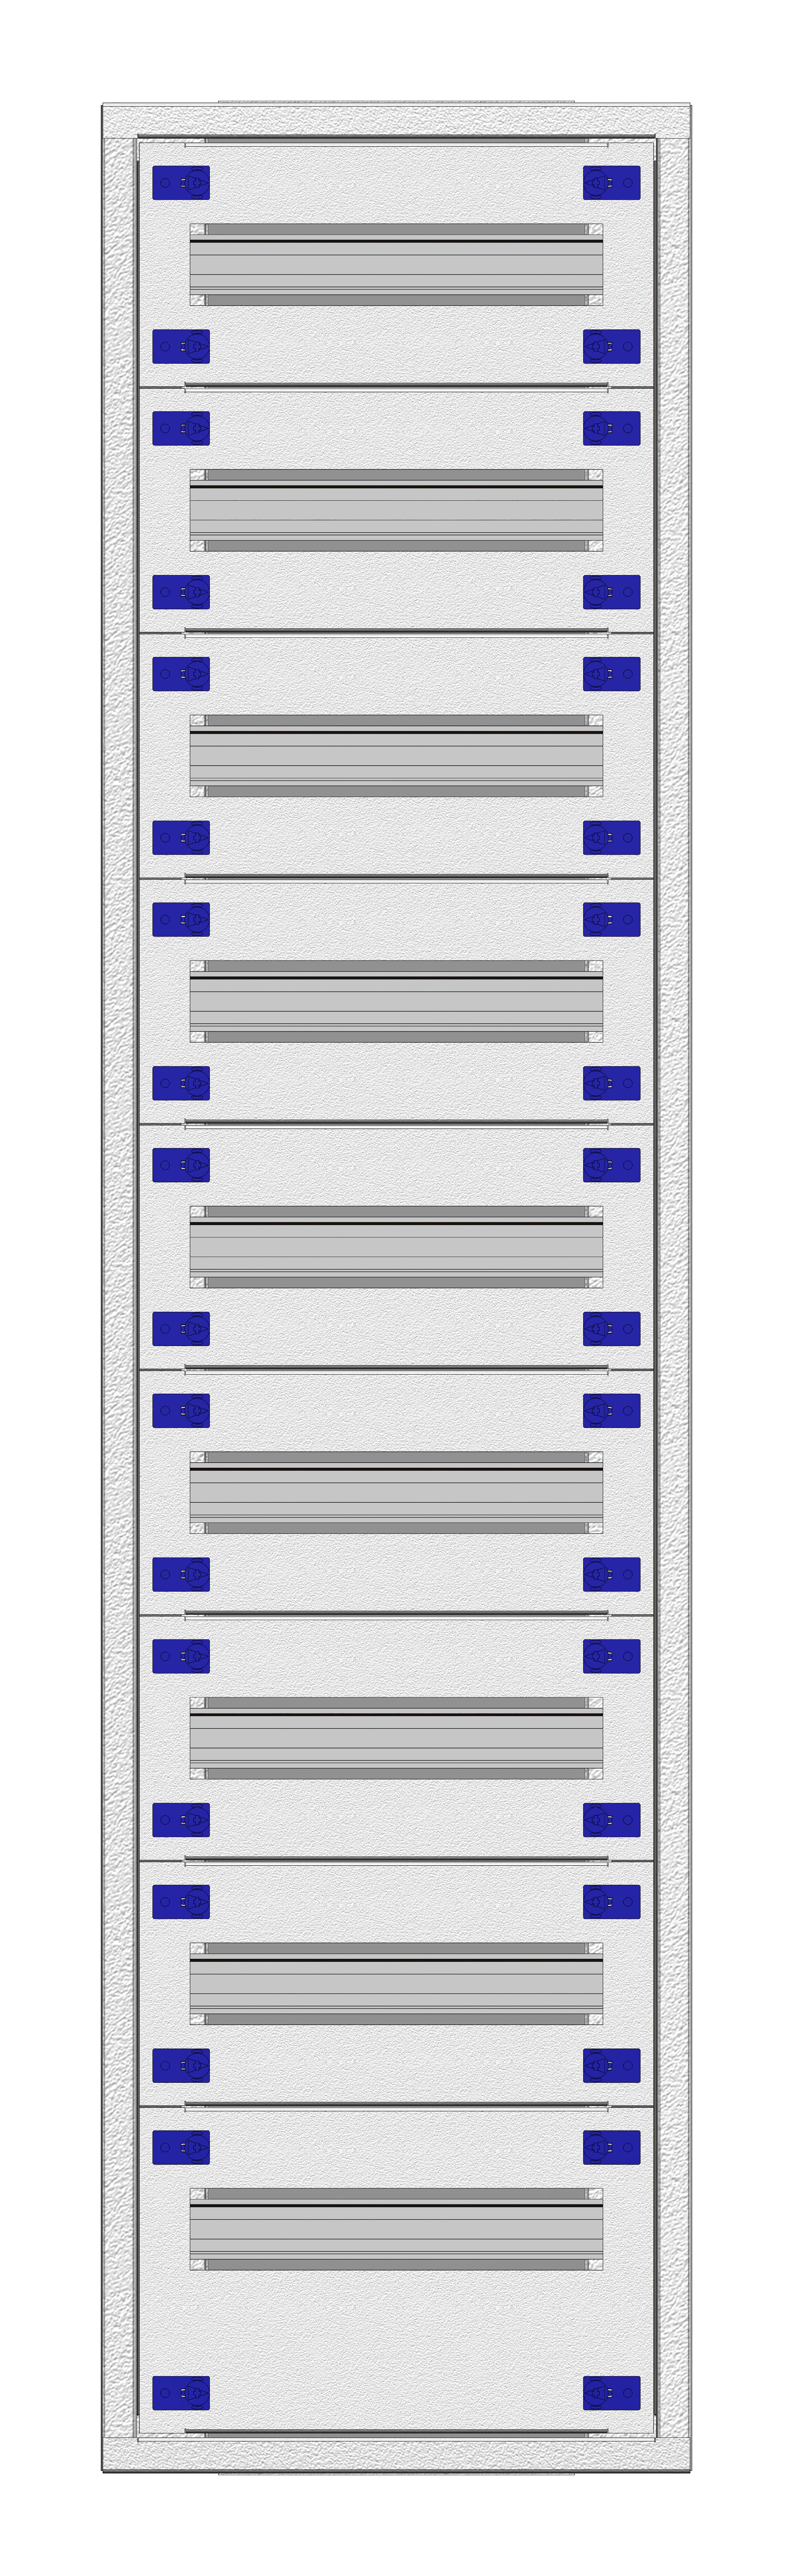 1 Stk Unterputz-Installationsverteiler 1U-28L, H1380B380T250mm IL172128UK